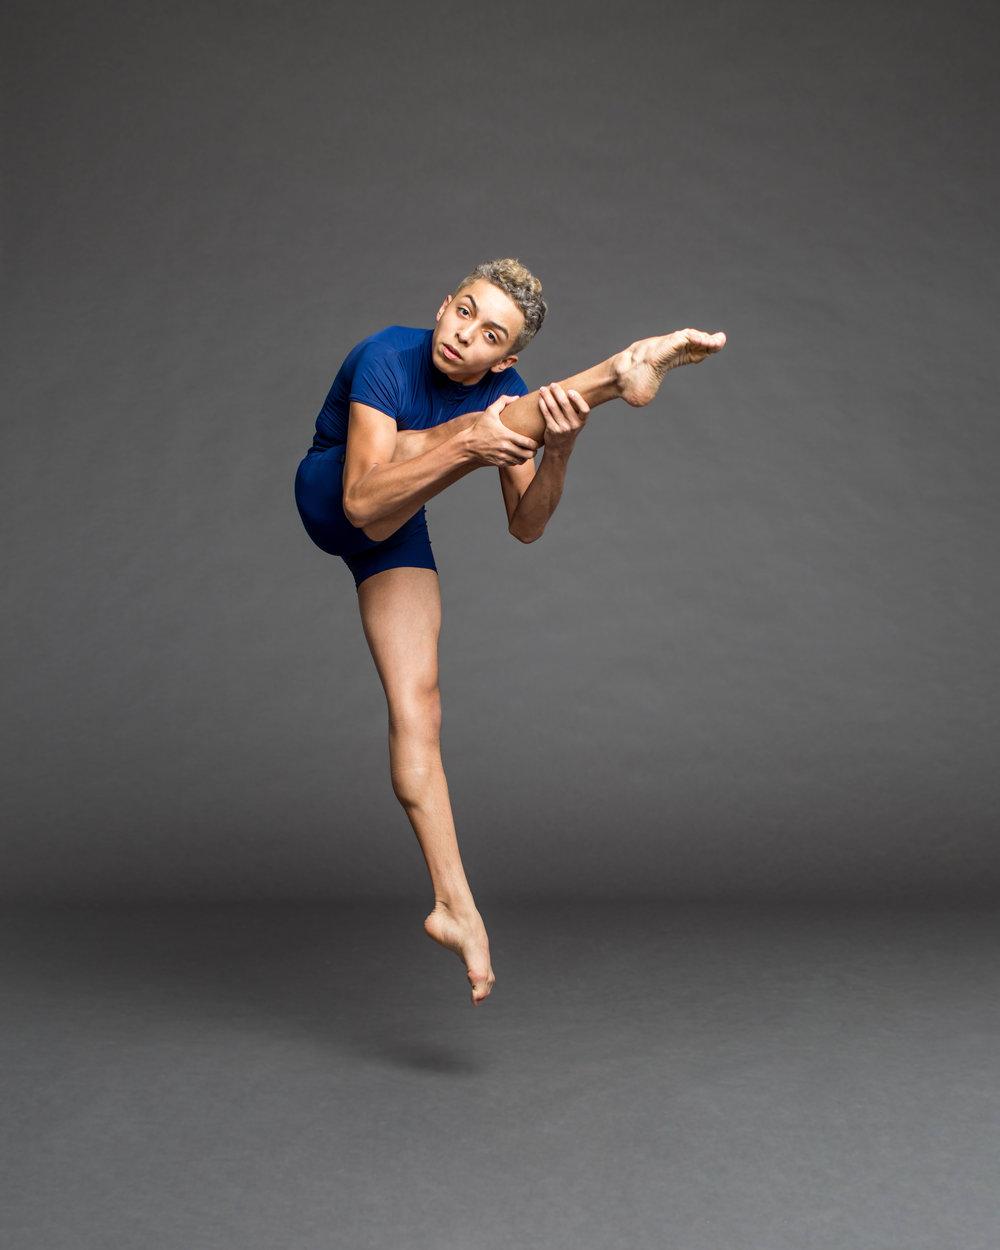 Gabriel Rocha jump.jpg